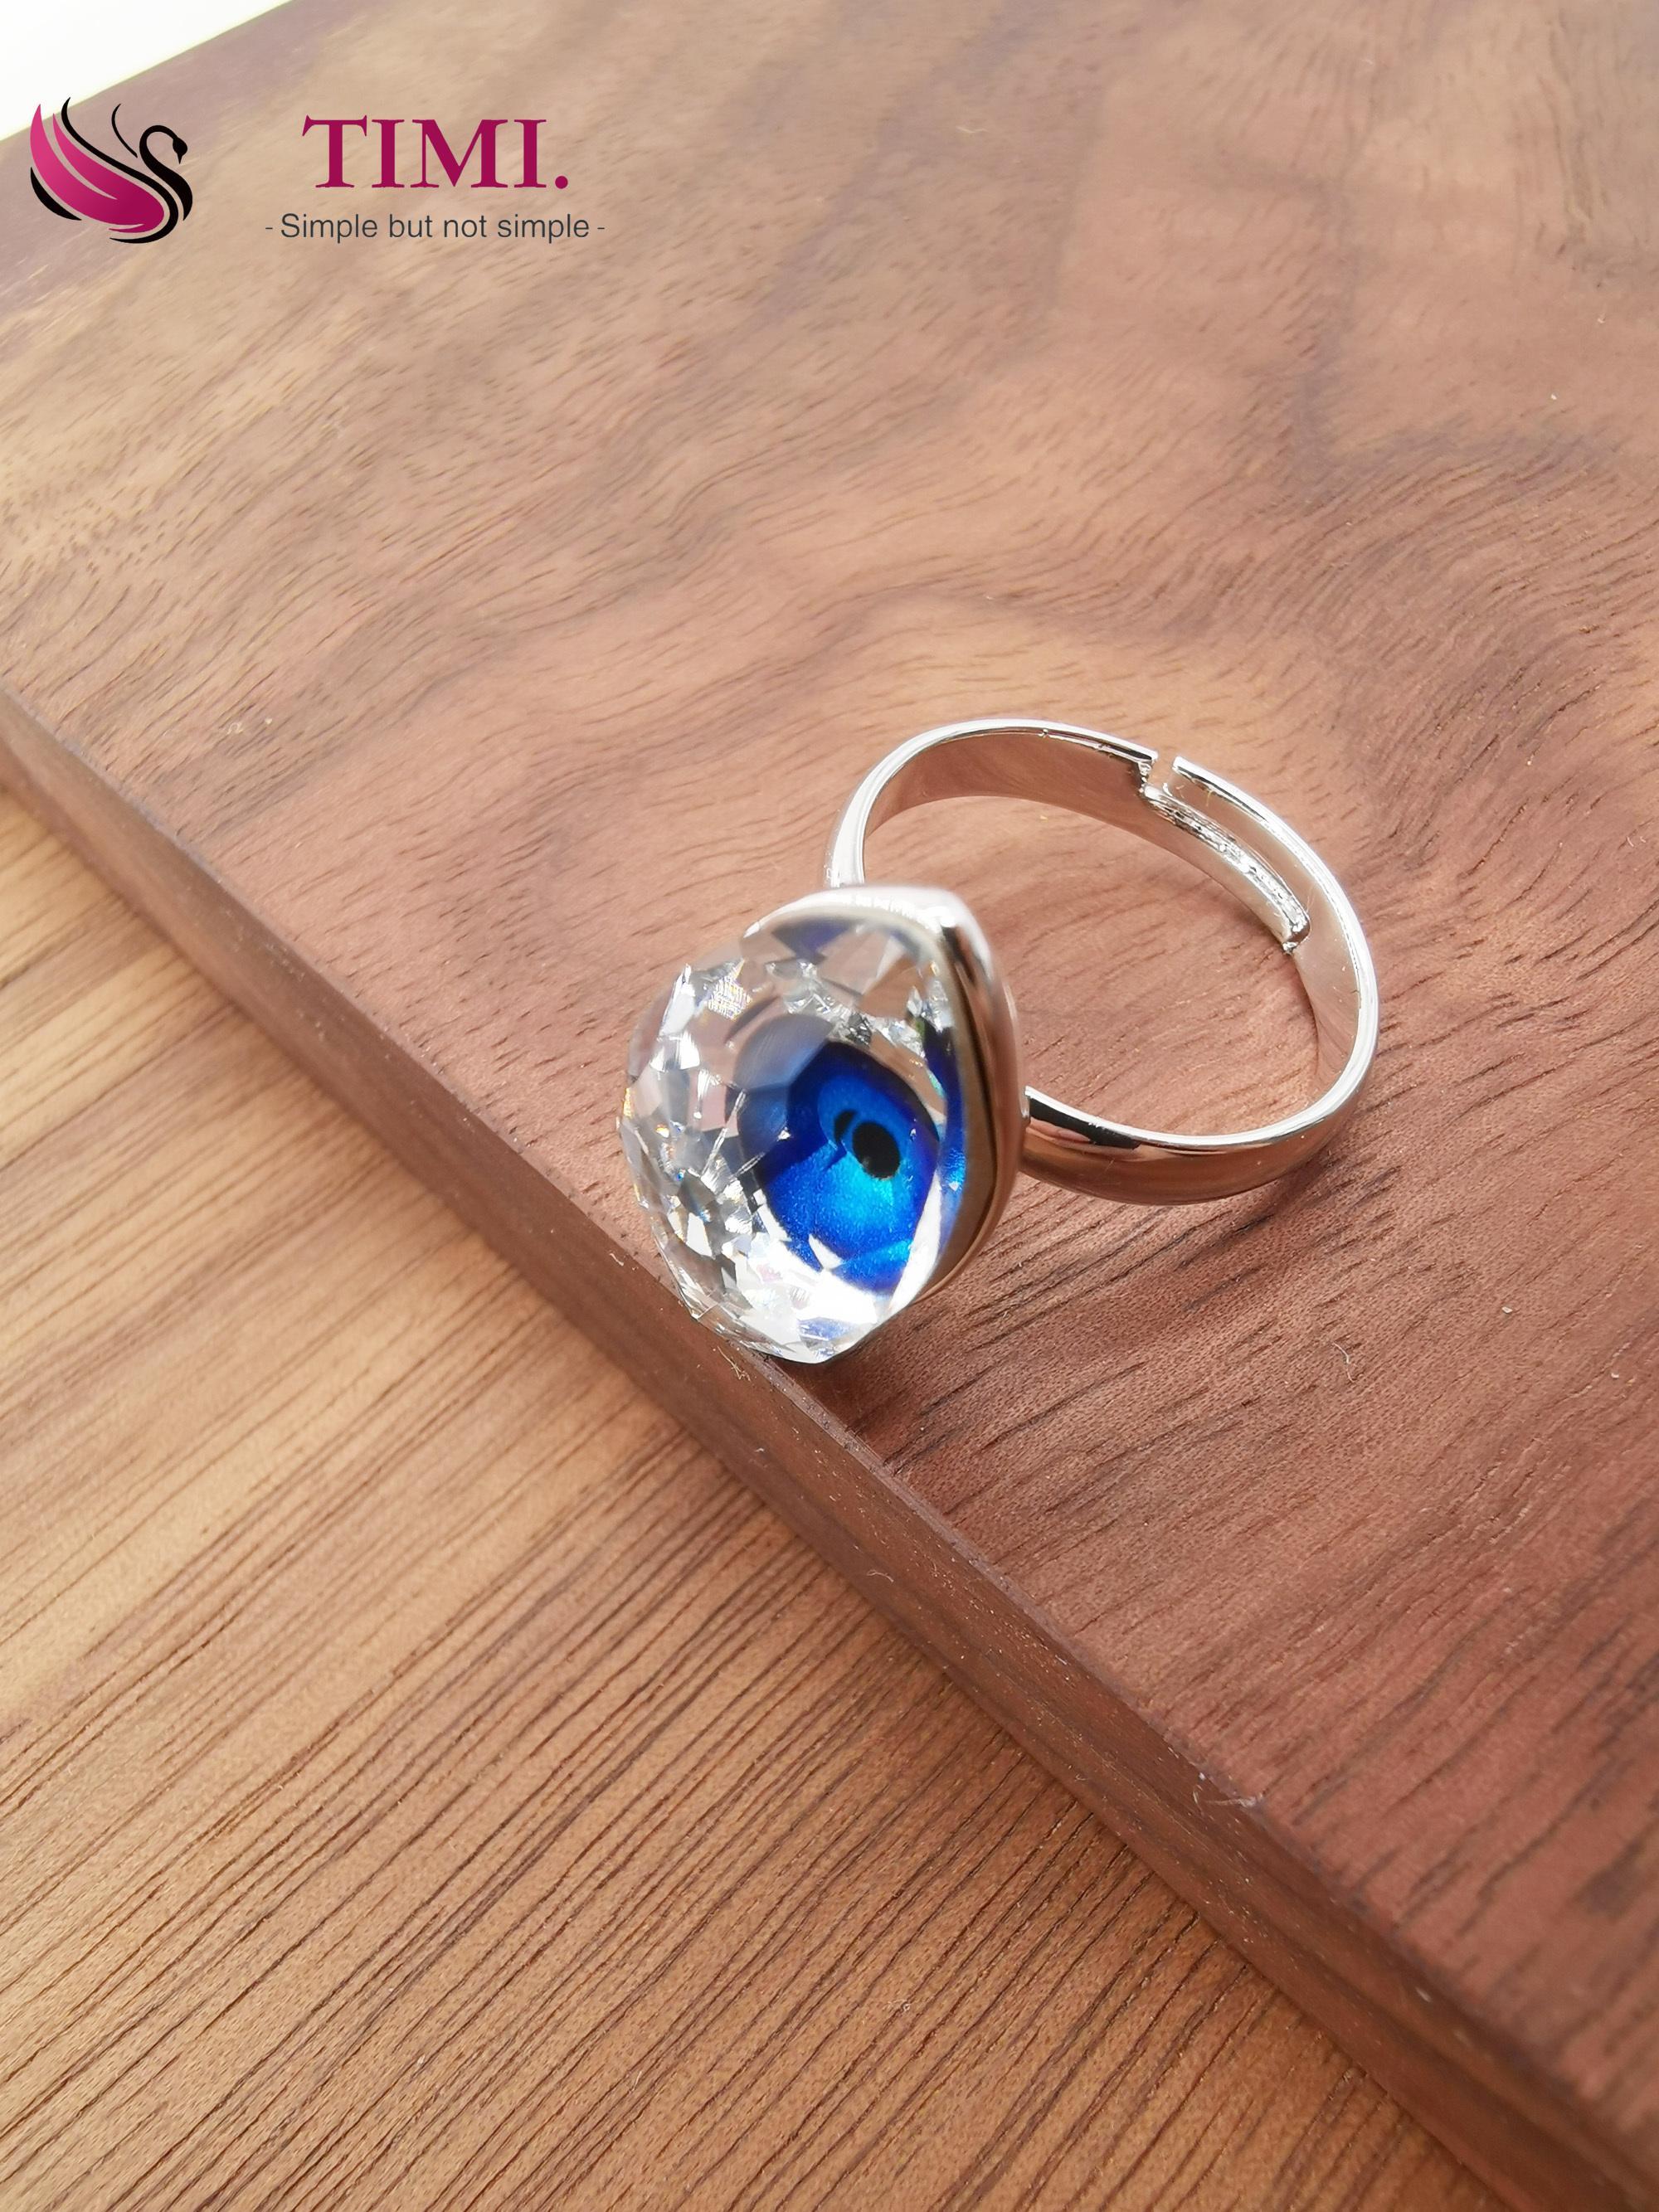 268ee9b1d8 Timi jewelry set Swarovski element crystal bracelet blue demon eye ring  lady necklace